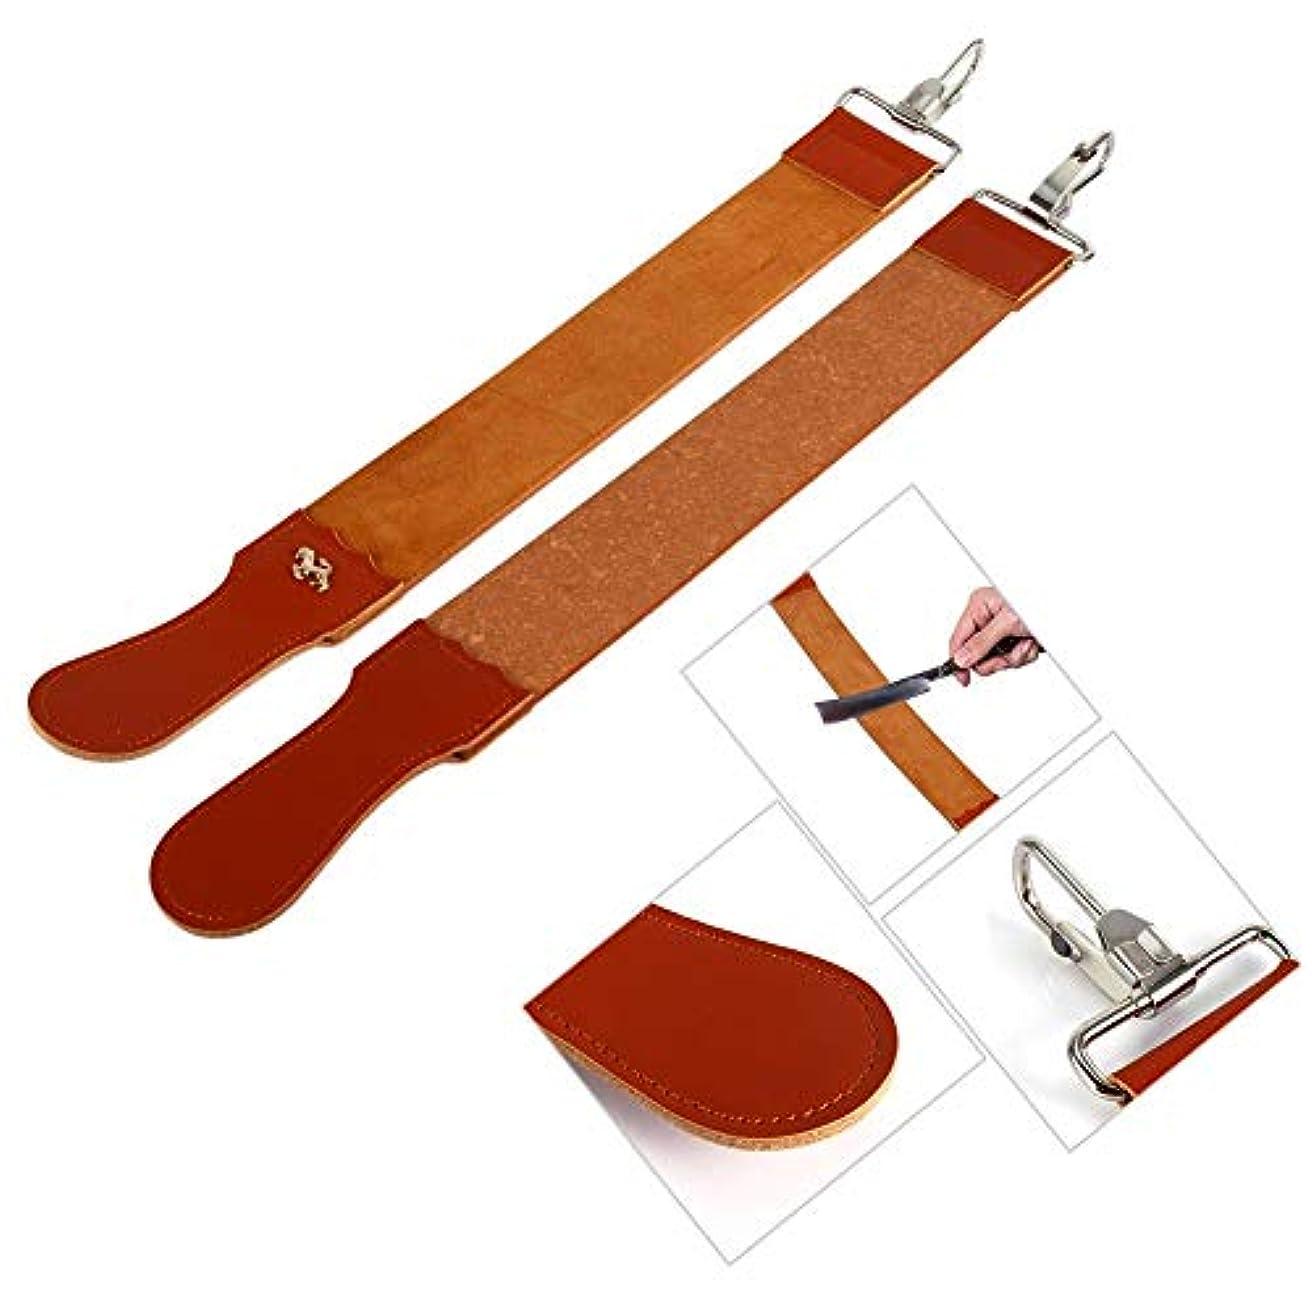 Qiilu 50.2×5.2cm 革砥 理容革砥 革砥ベルト 研磨 砥ぎ 床屋 理容室 家庭用 男性シェービング